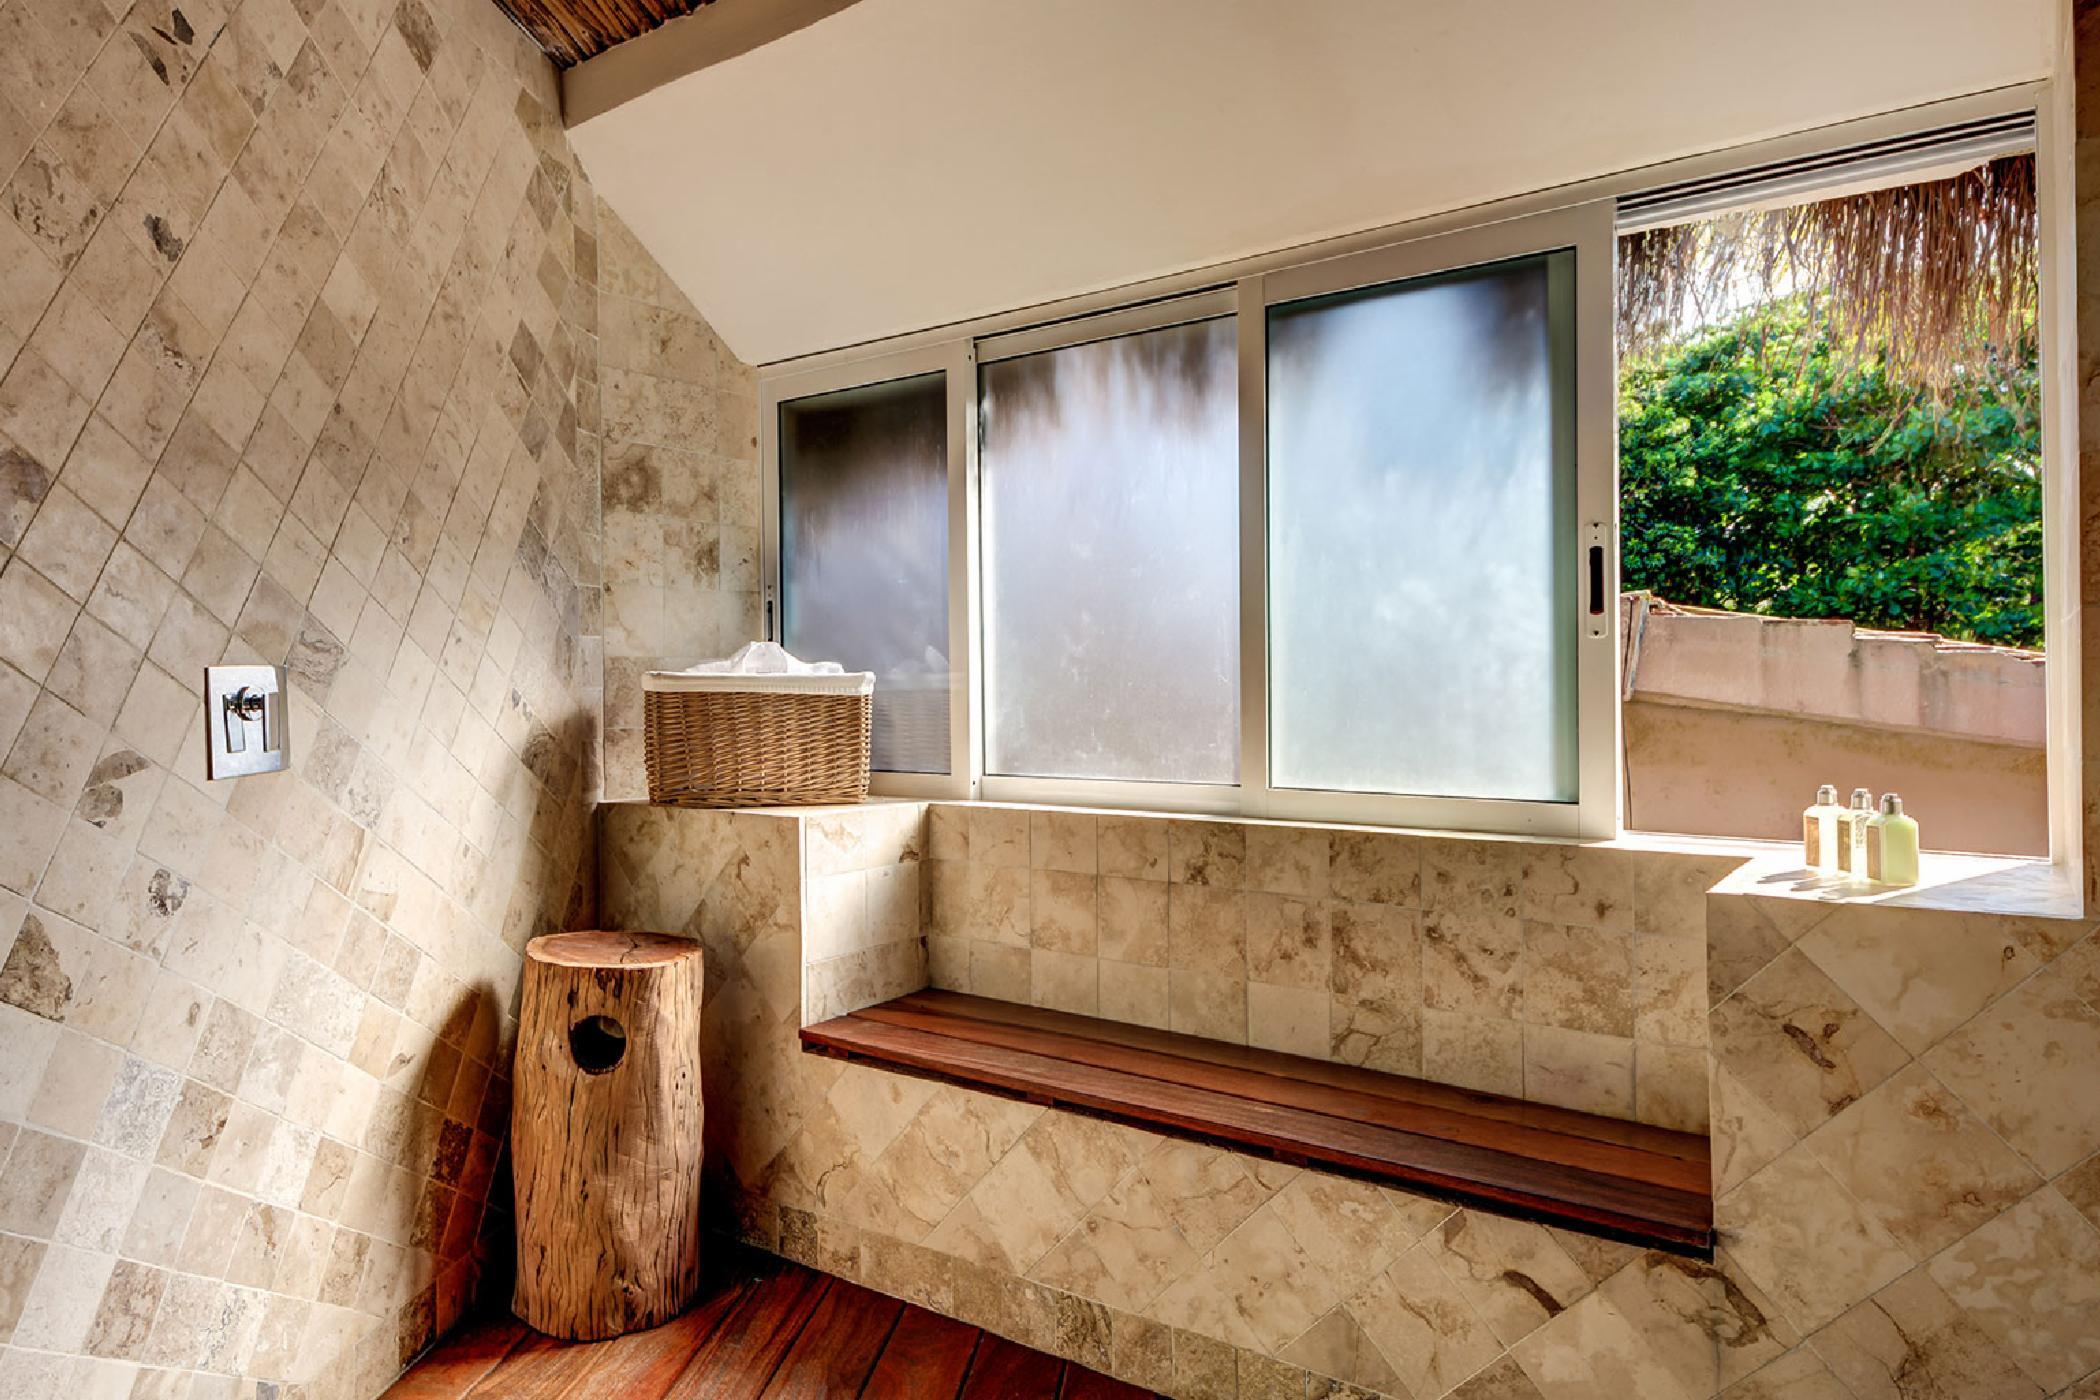 Maya_Luxe_Riviera_Maya_Luxury_Villas_Experiences_Puerto_Aventuras_5_Bedrooms_Zacil_Na_16.jpg